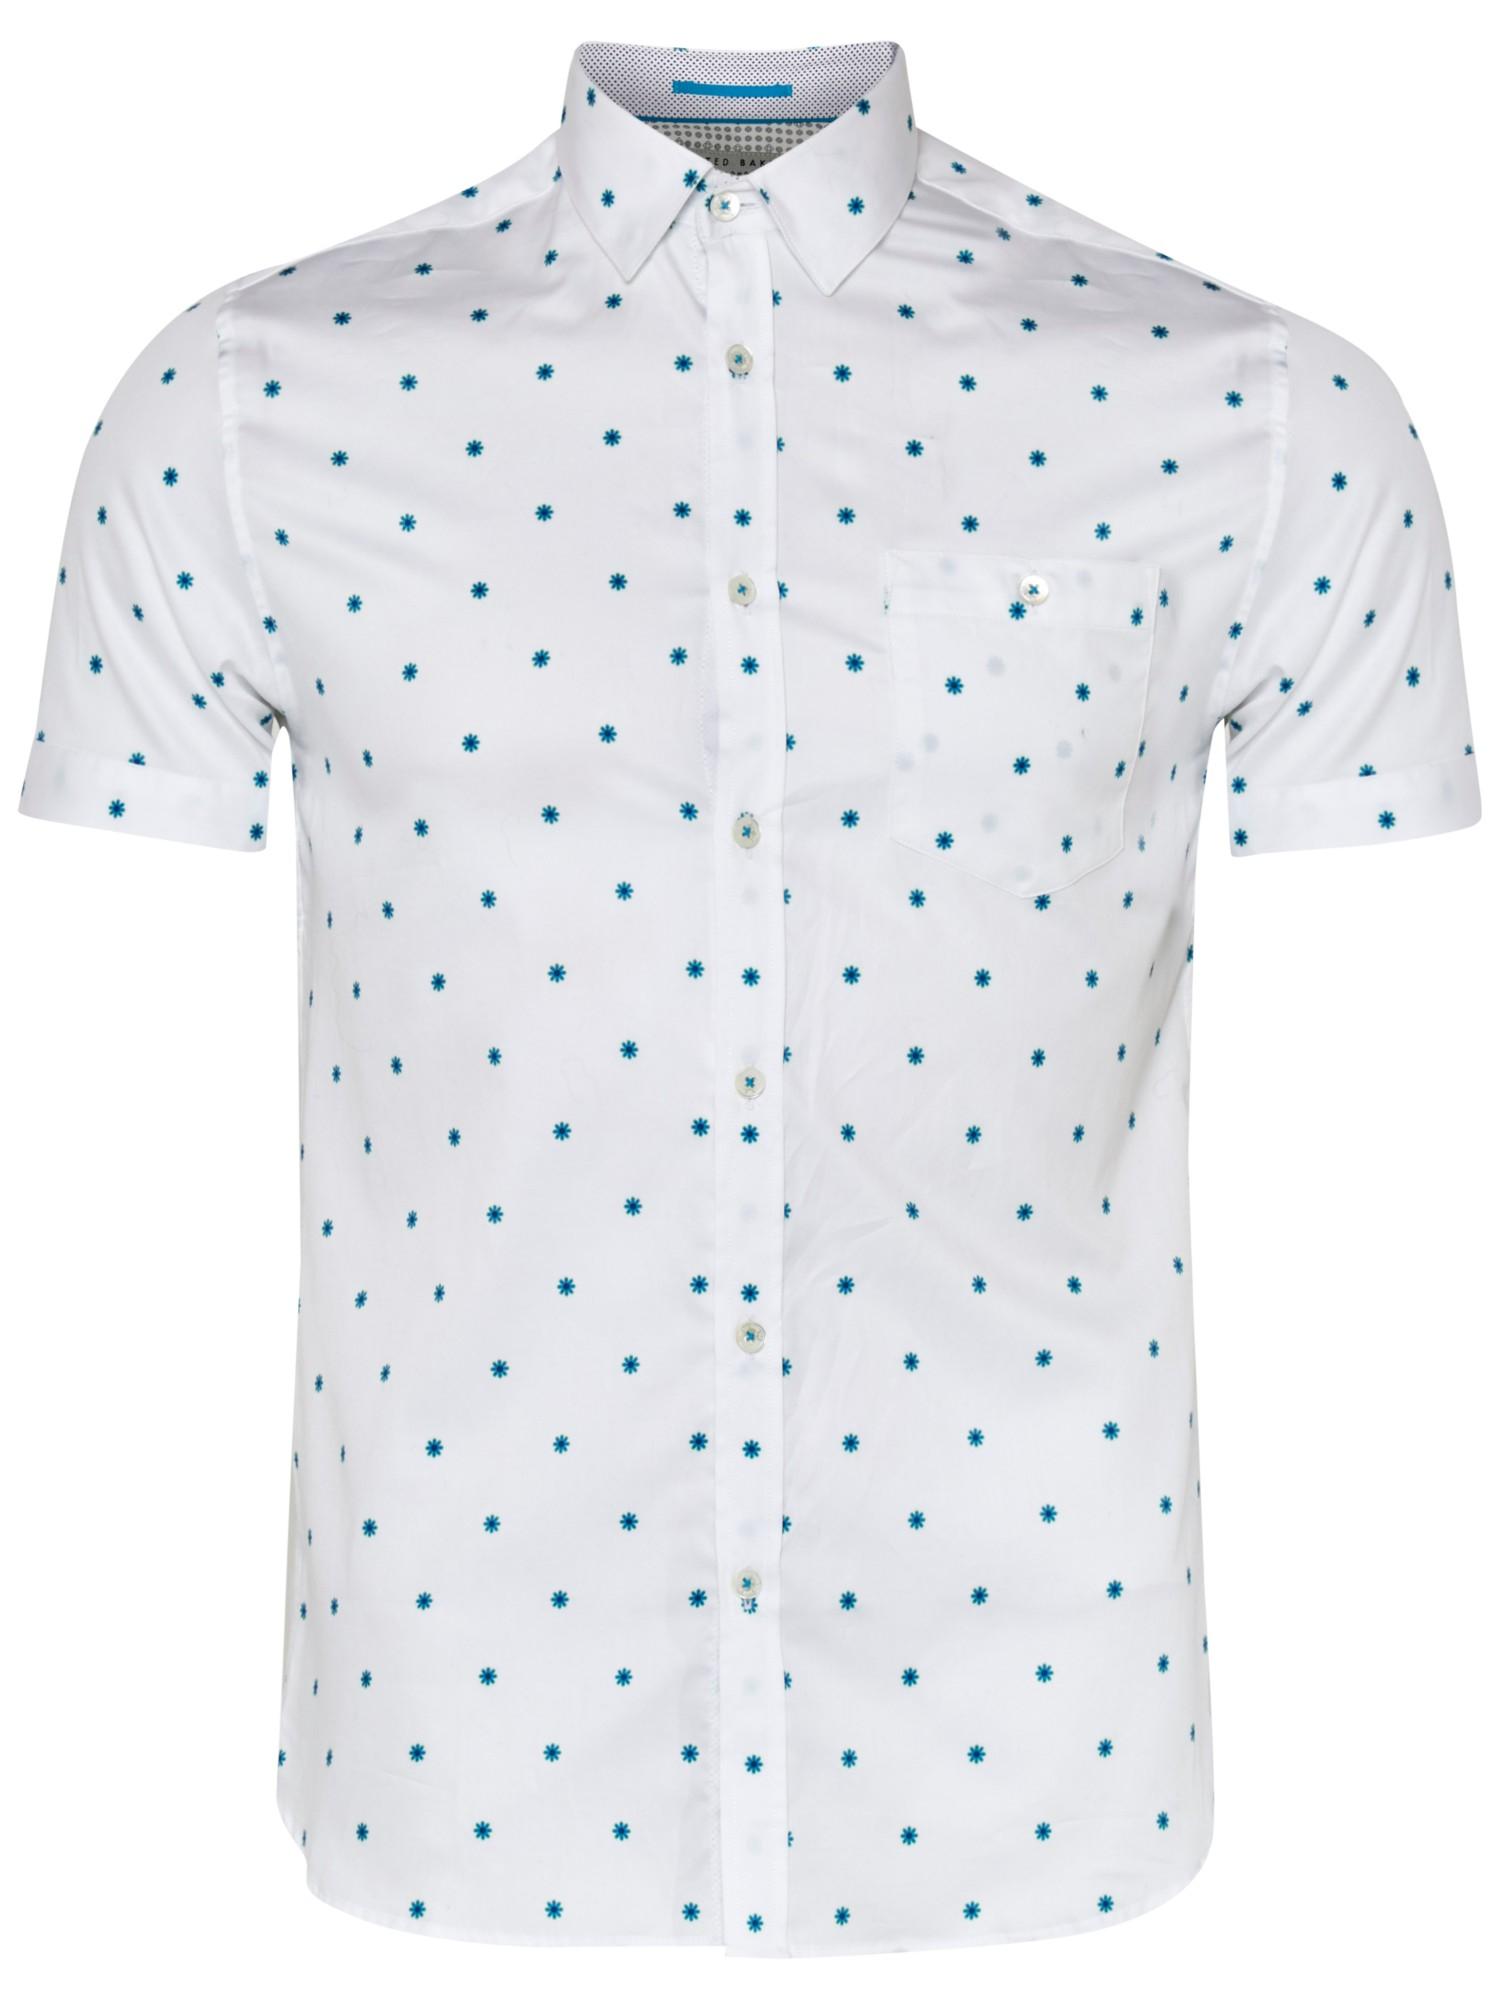 Lyst ted baker mydance short sleeve shirt in blue for men for Ted baker shirts sale online